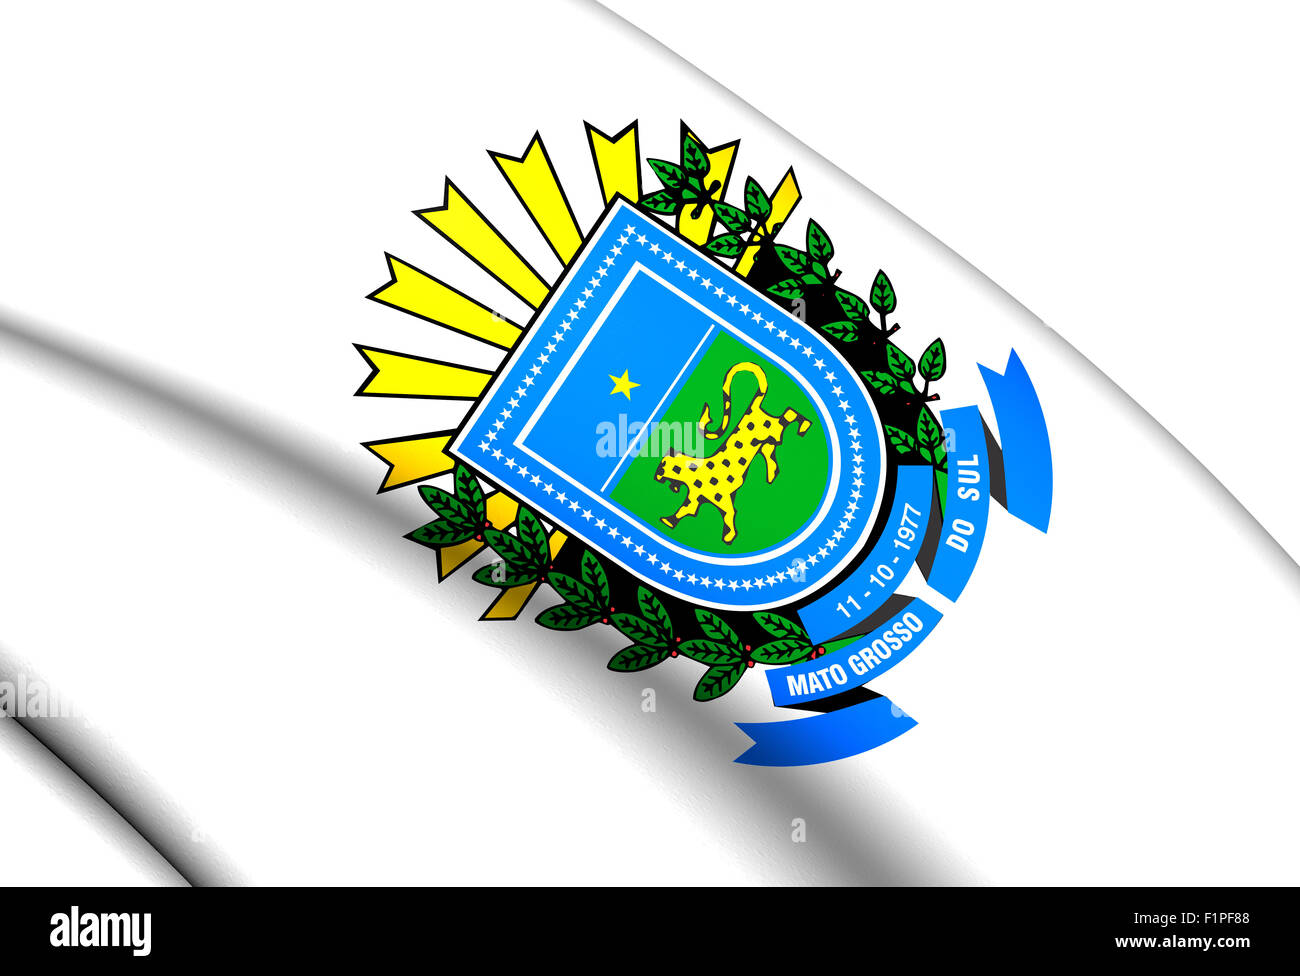 Mato Grosso do Sul Coat of Arms, Brazil. Close Up. Stock Photo